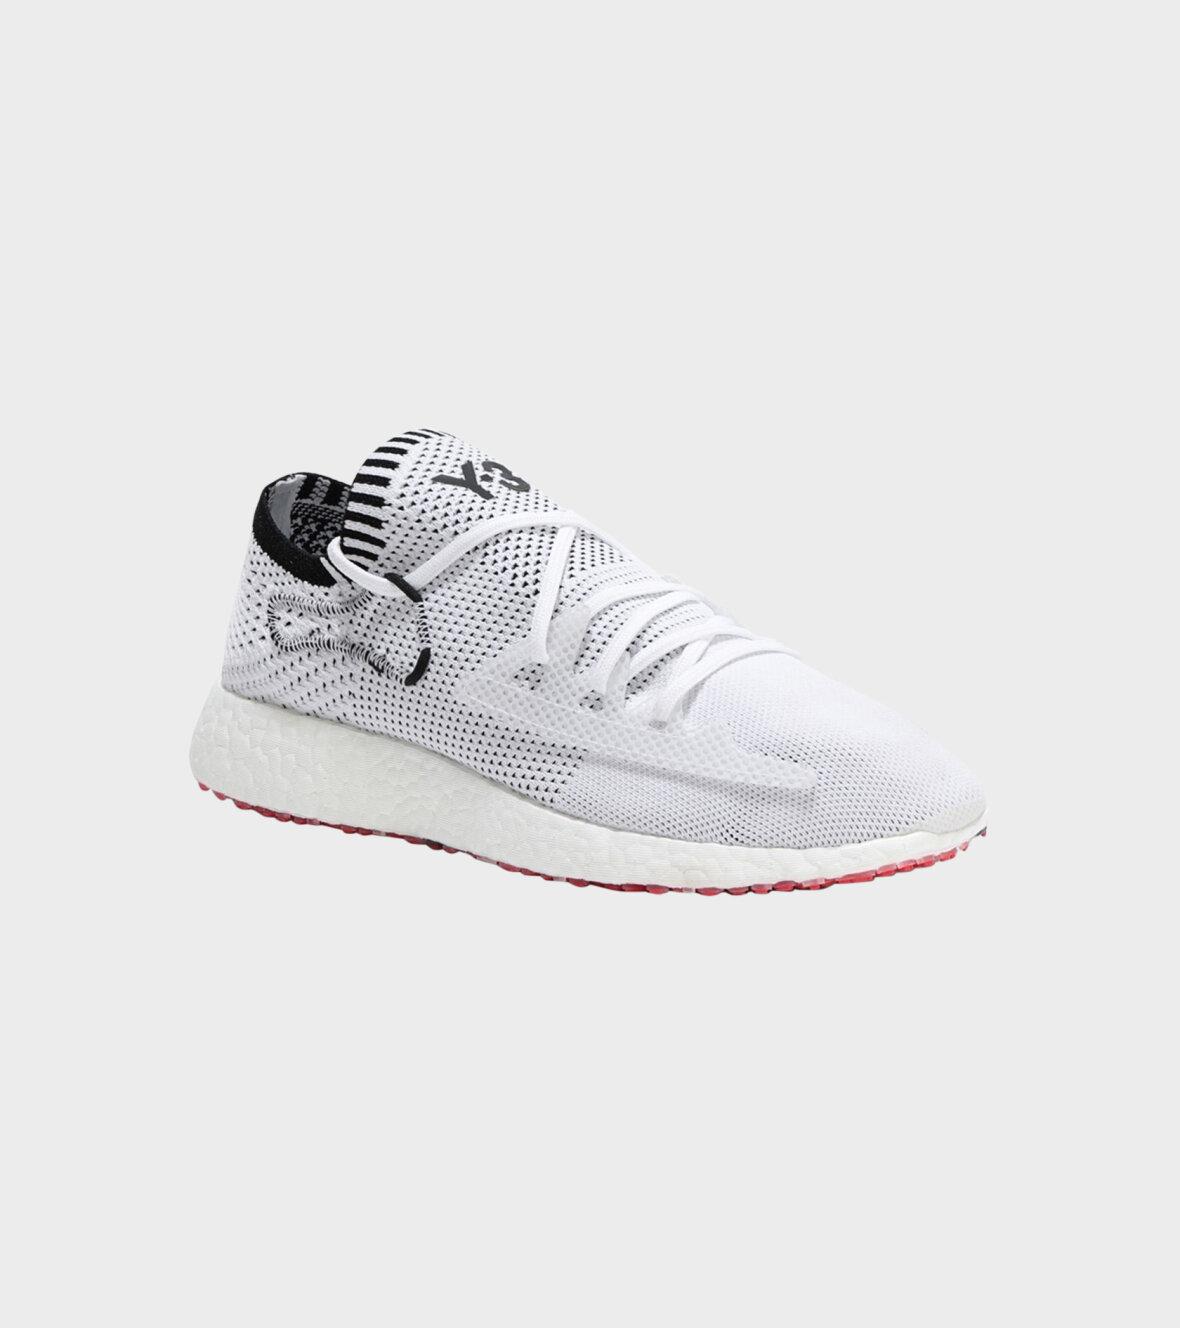 Y 3 Y 3 Raito Racer Sneakers E f | Adidas superstar white